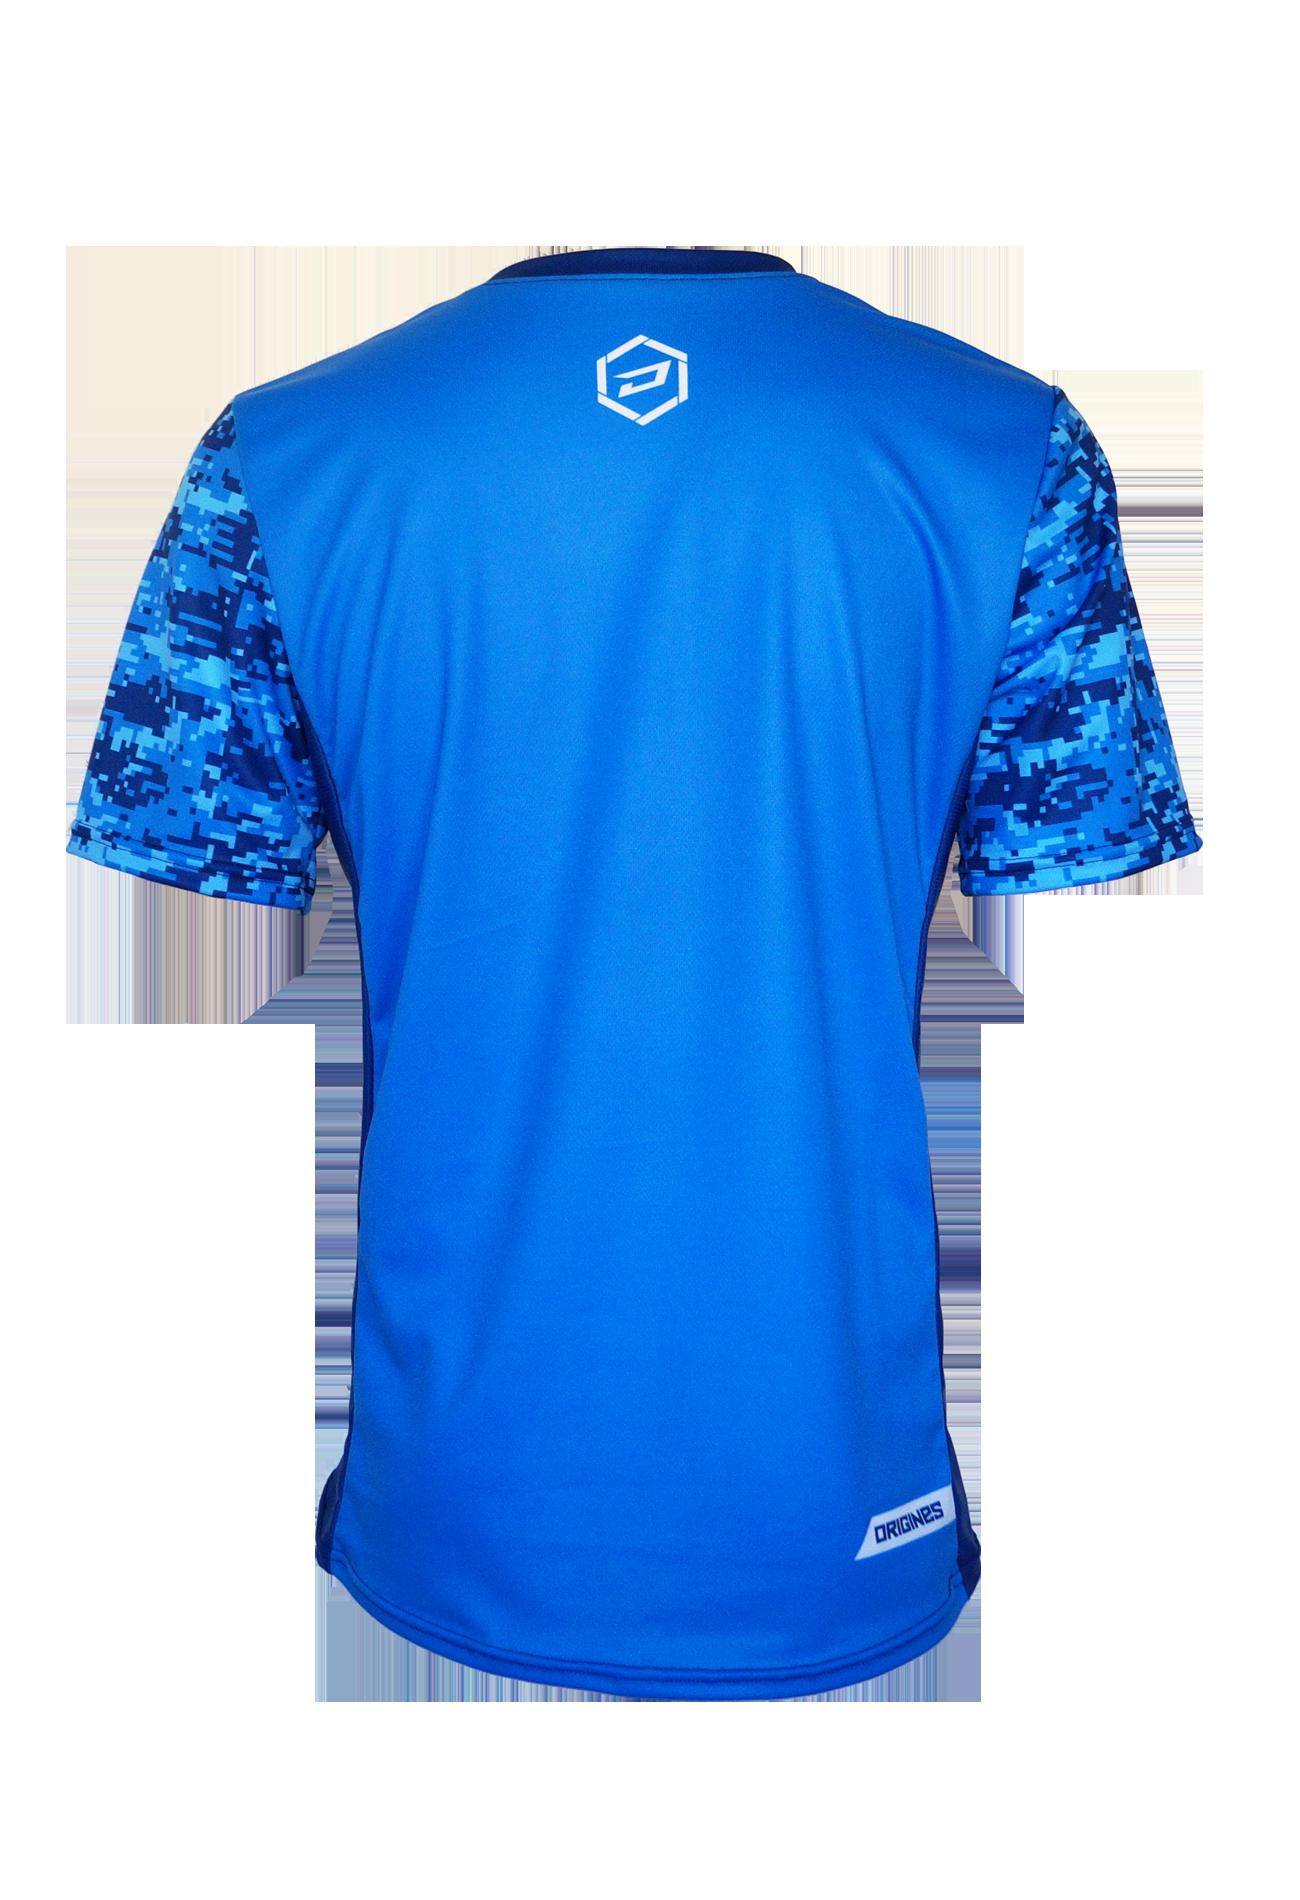 Digital bleu back